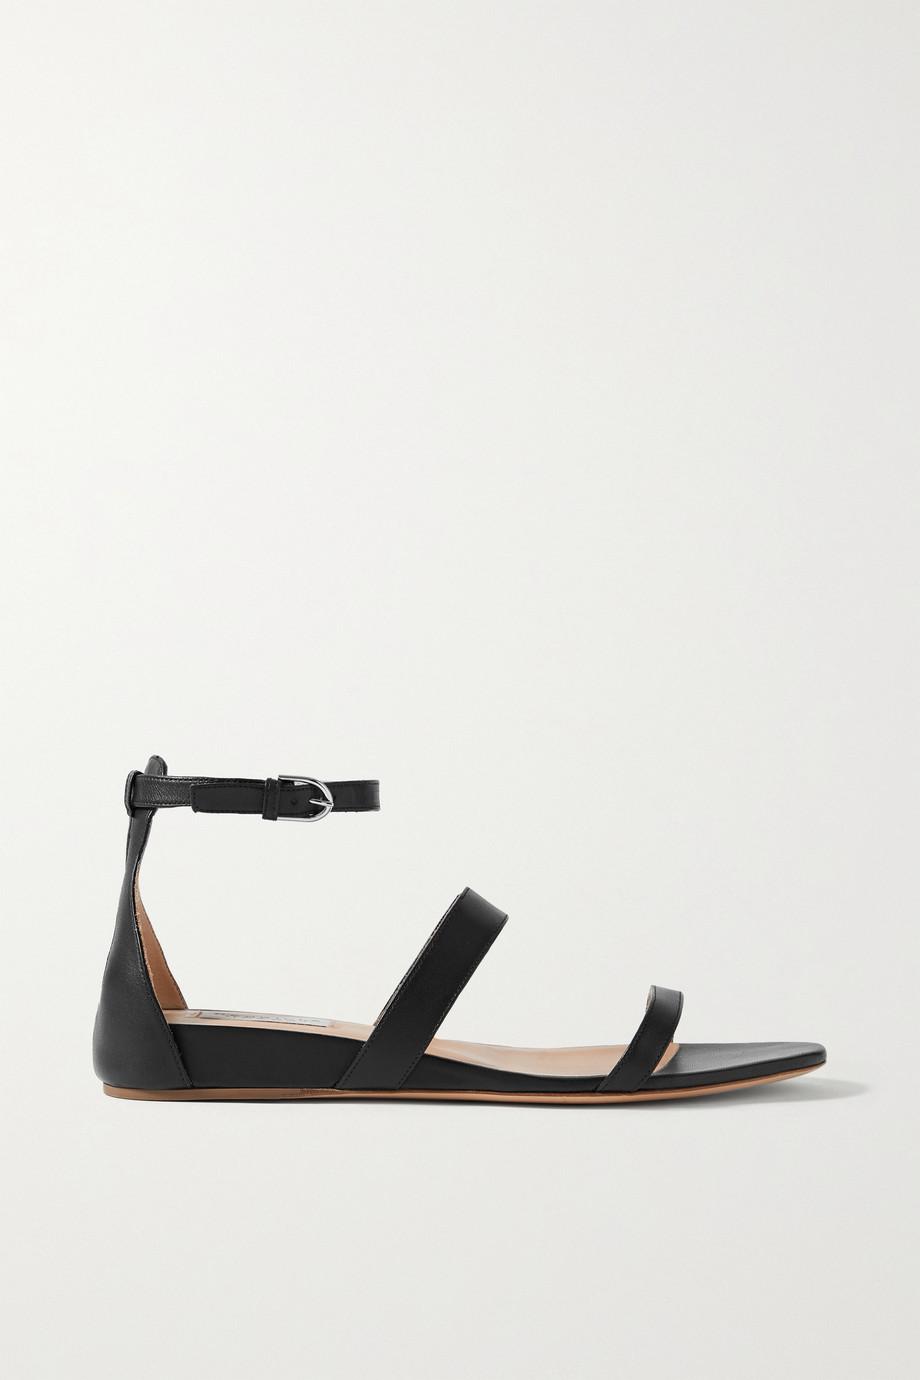 Gabriela Hearst Lekker leather wedge sandals